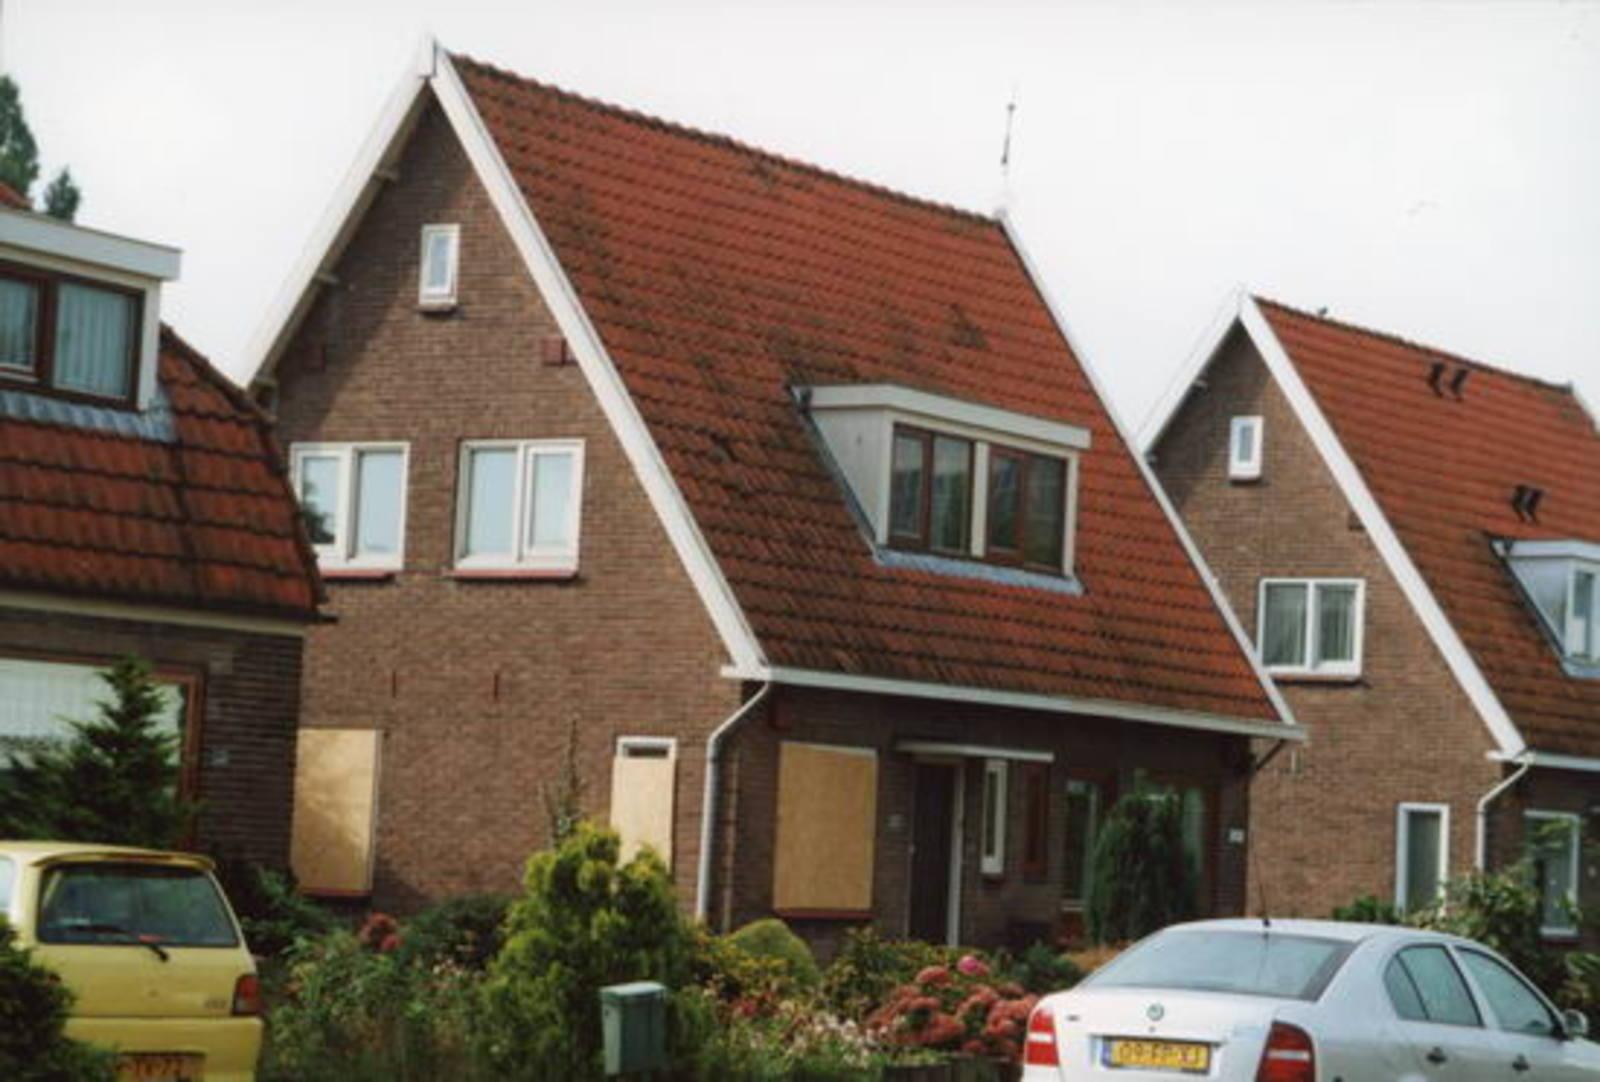 Rijnlanderweg O 0806-808 200_ Huize 01